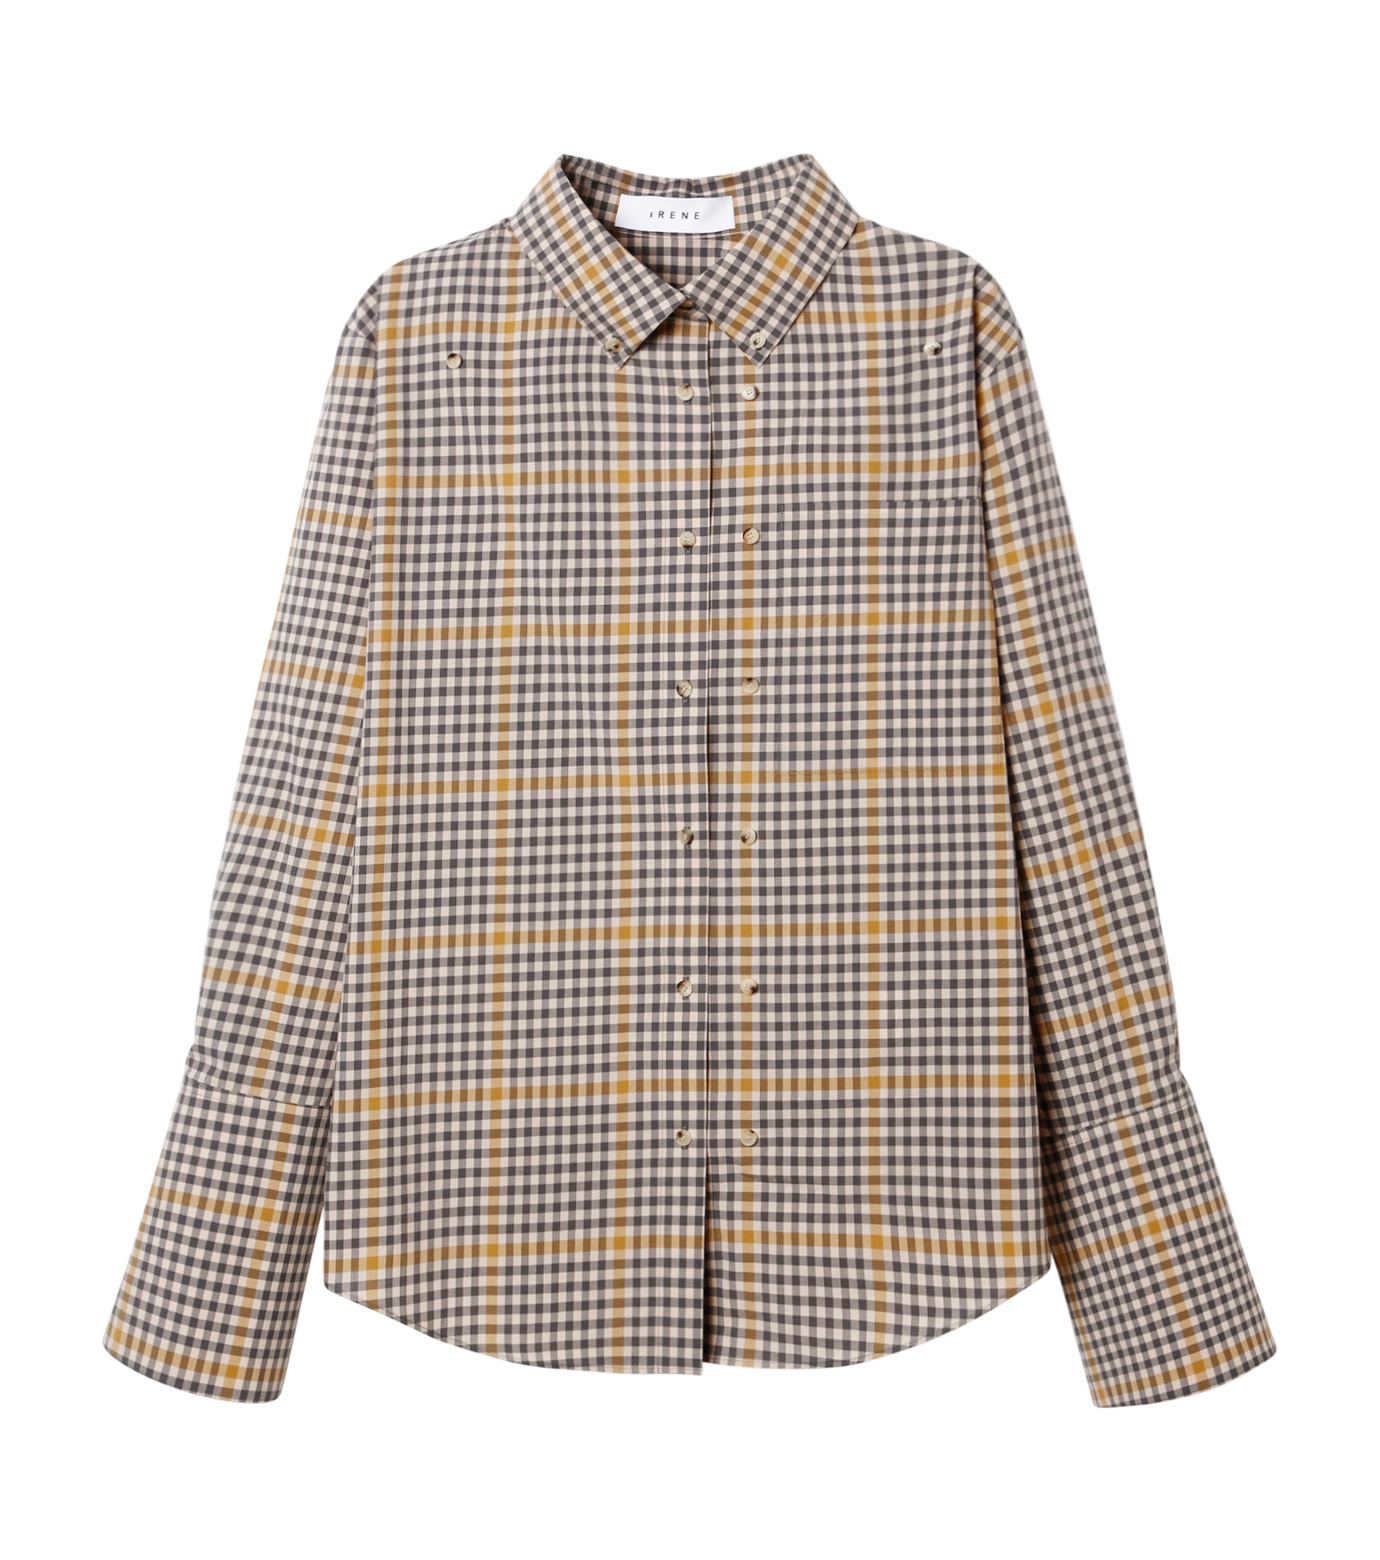 IRENE(アイレネ)のグラフチェックシャツ-LIGHT BEIGE(シャツ/shirt)-19S83001 拡大詳細画像6